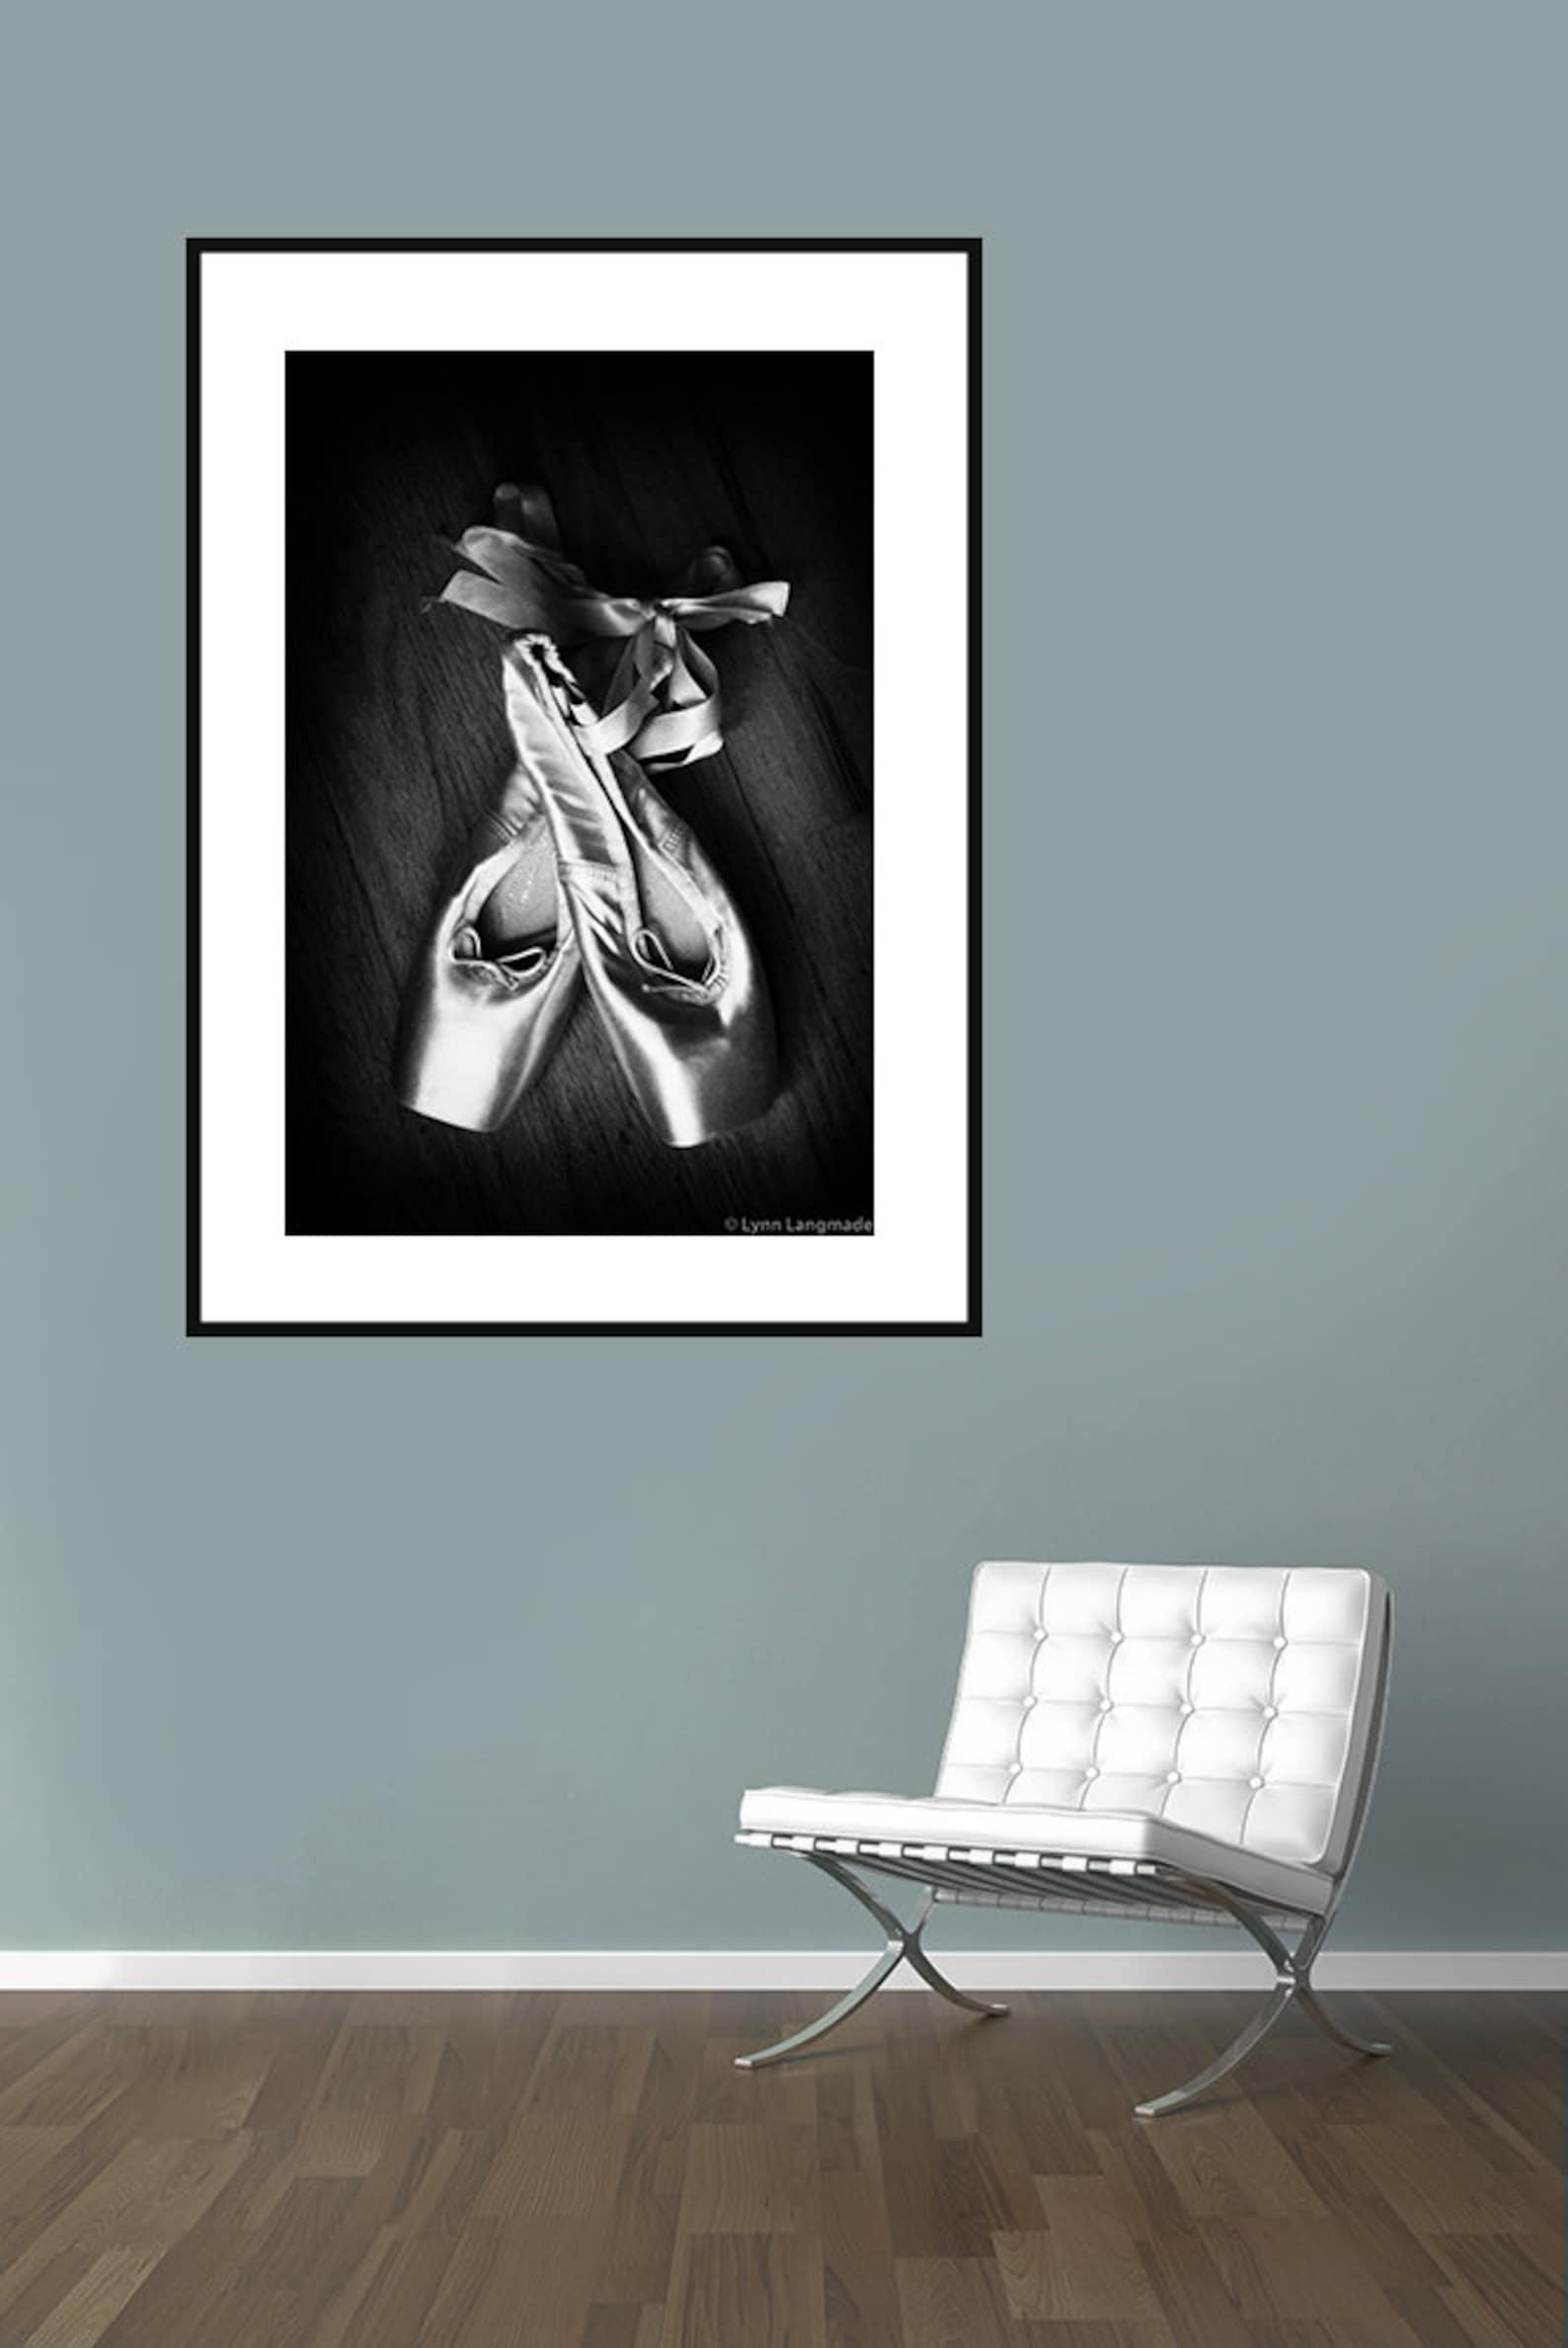 ballet art - pointe shoes black white 8x10 prints 11x14 large art 16x20 ballet prints ballerina dance photography